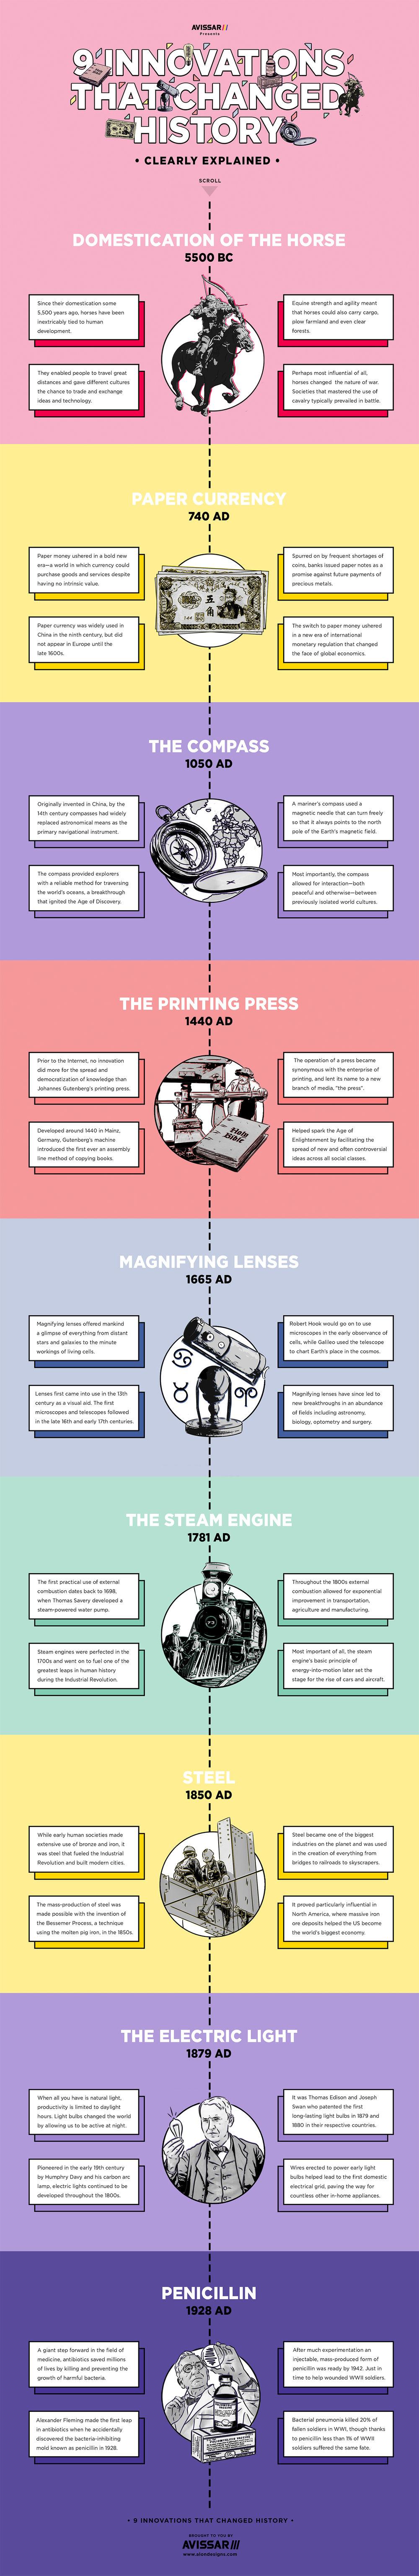 9_Innovations_That_Changed_History_by_Alon_Avissar-2.jpg